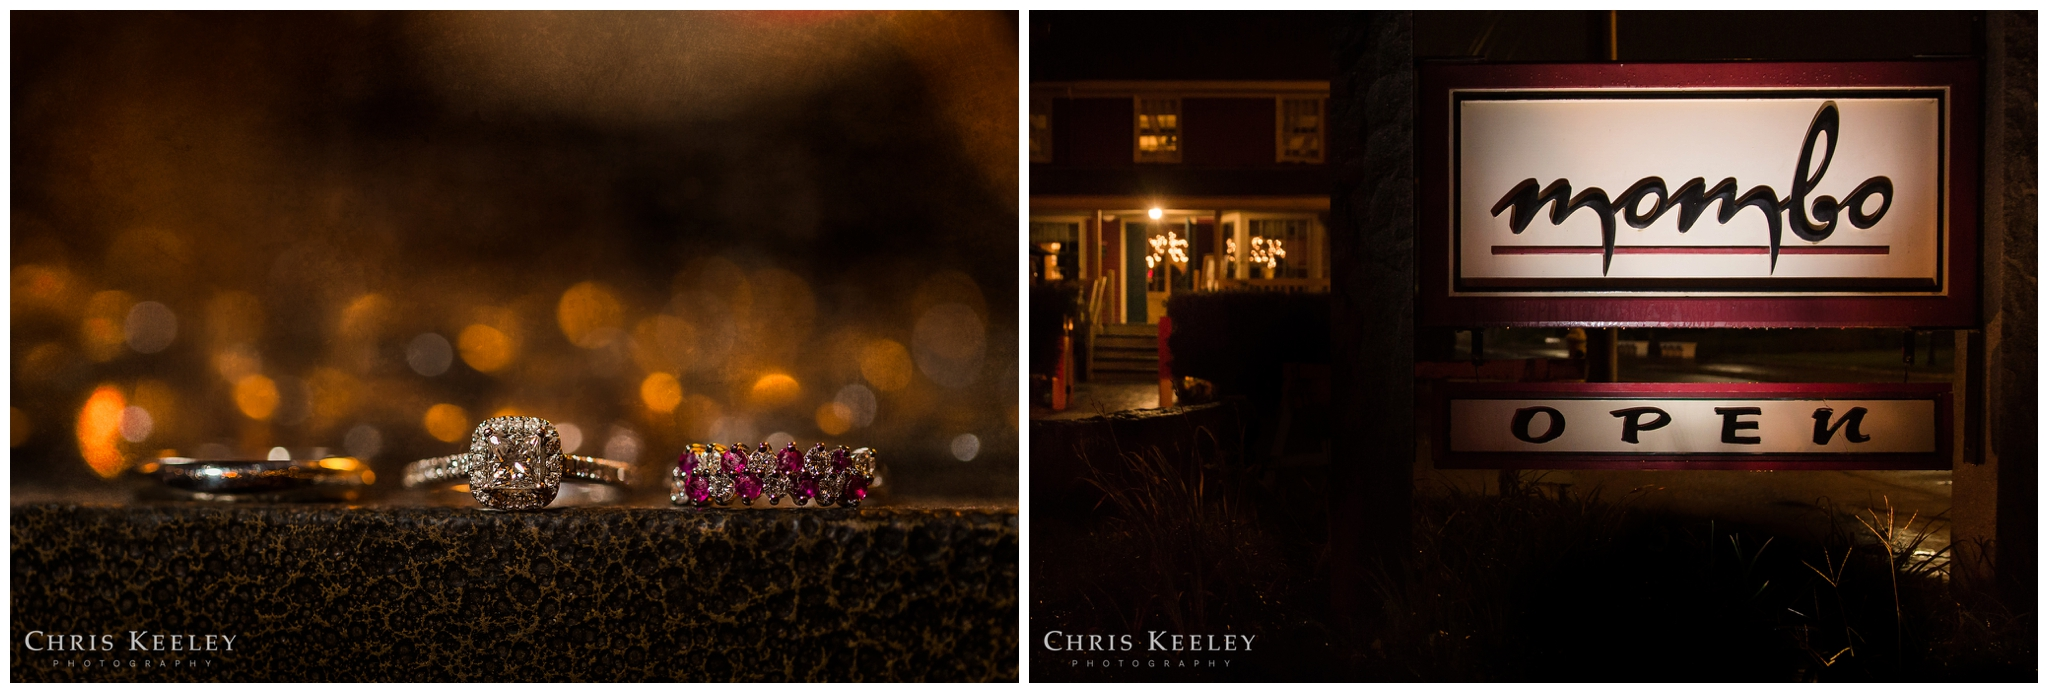 portsmouth-new-hampshire-fall-wedding-chris-keeley-photography-08.jpg